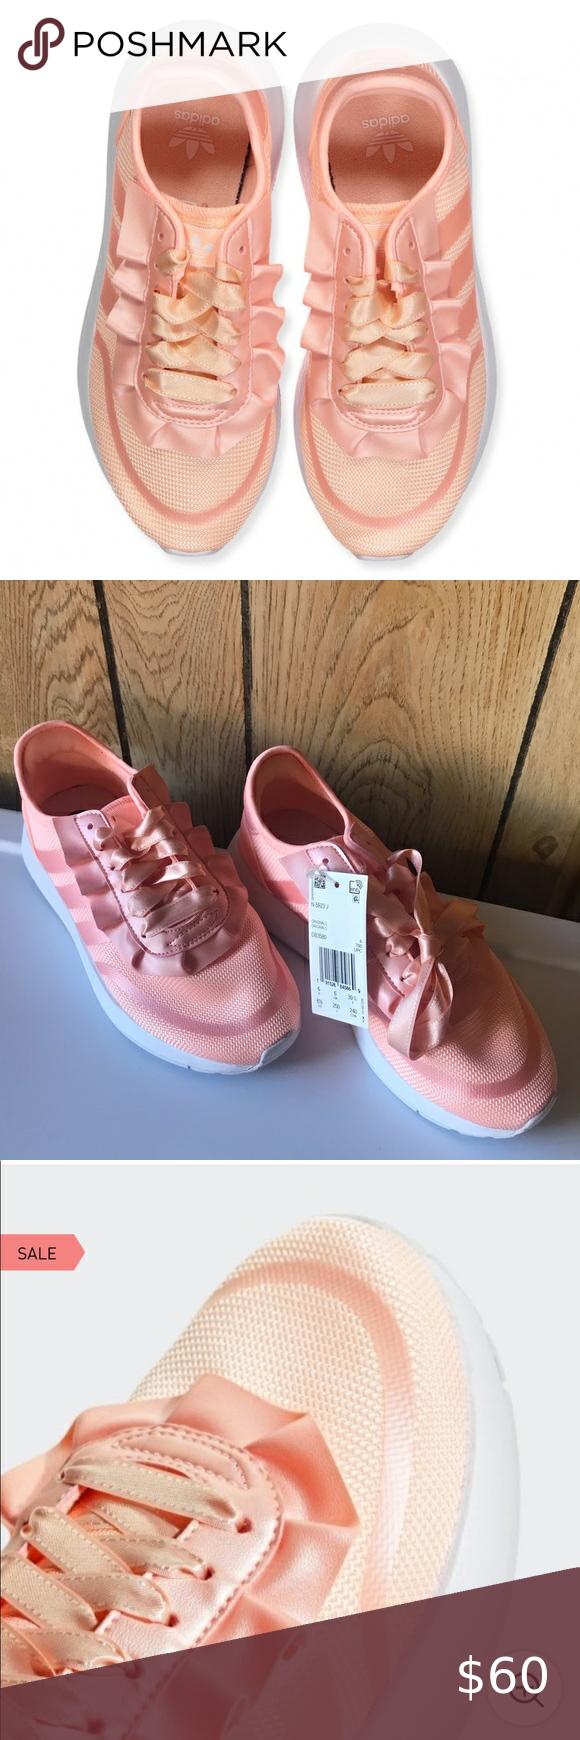 NWT ADIDAS blush pink ribbon athletic